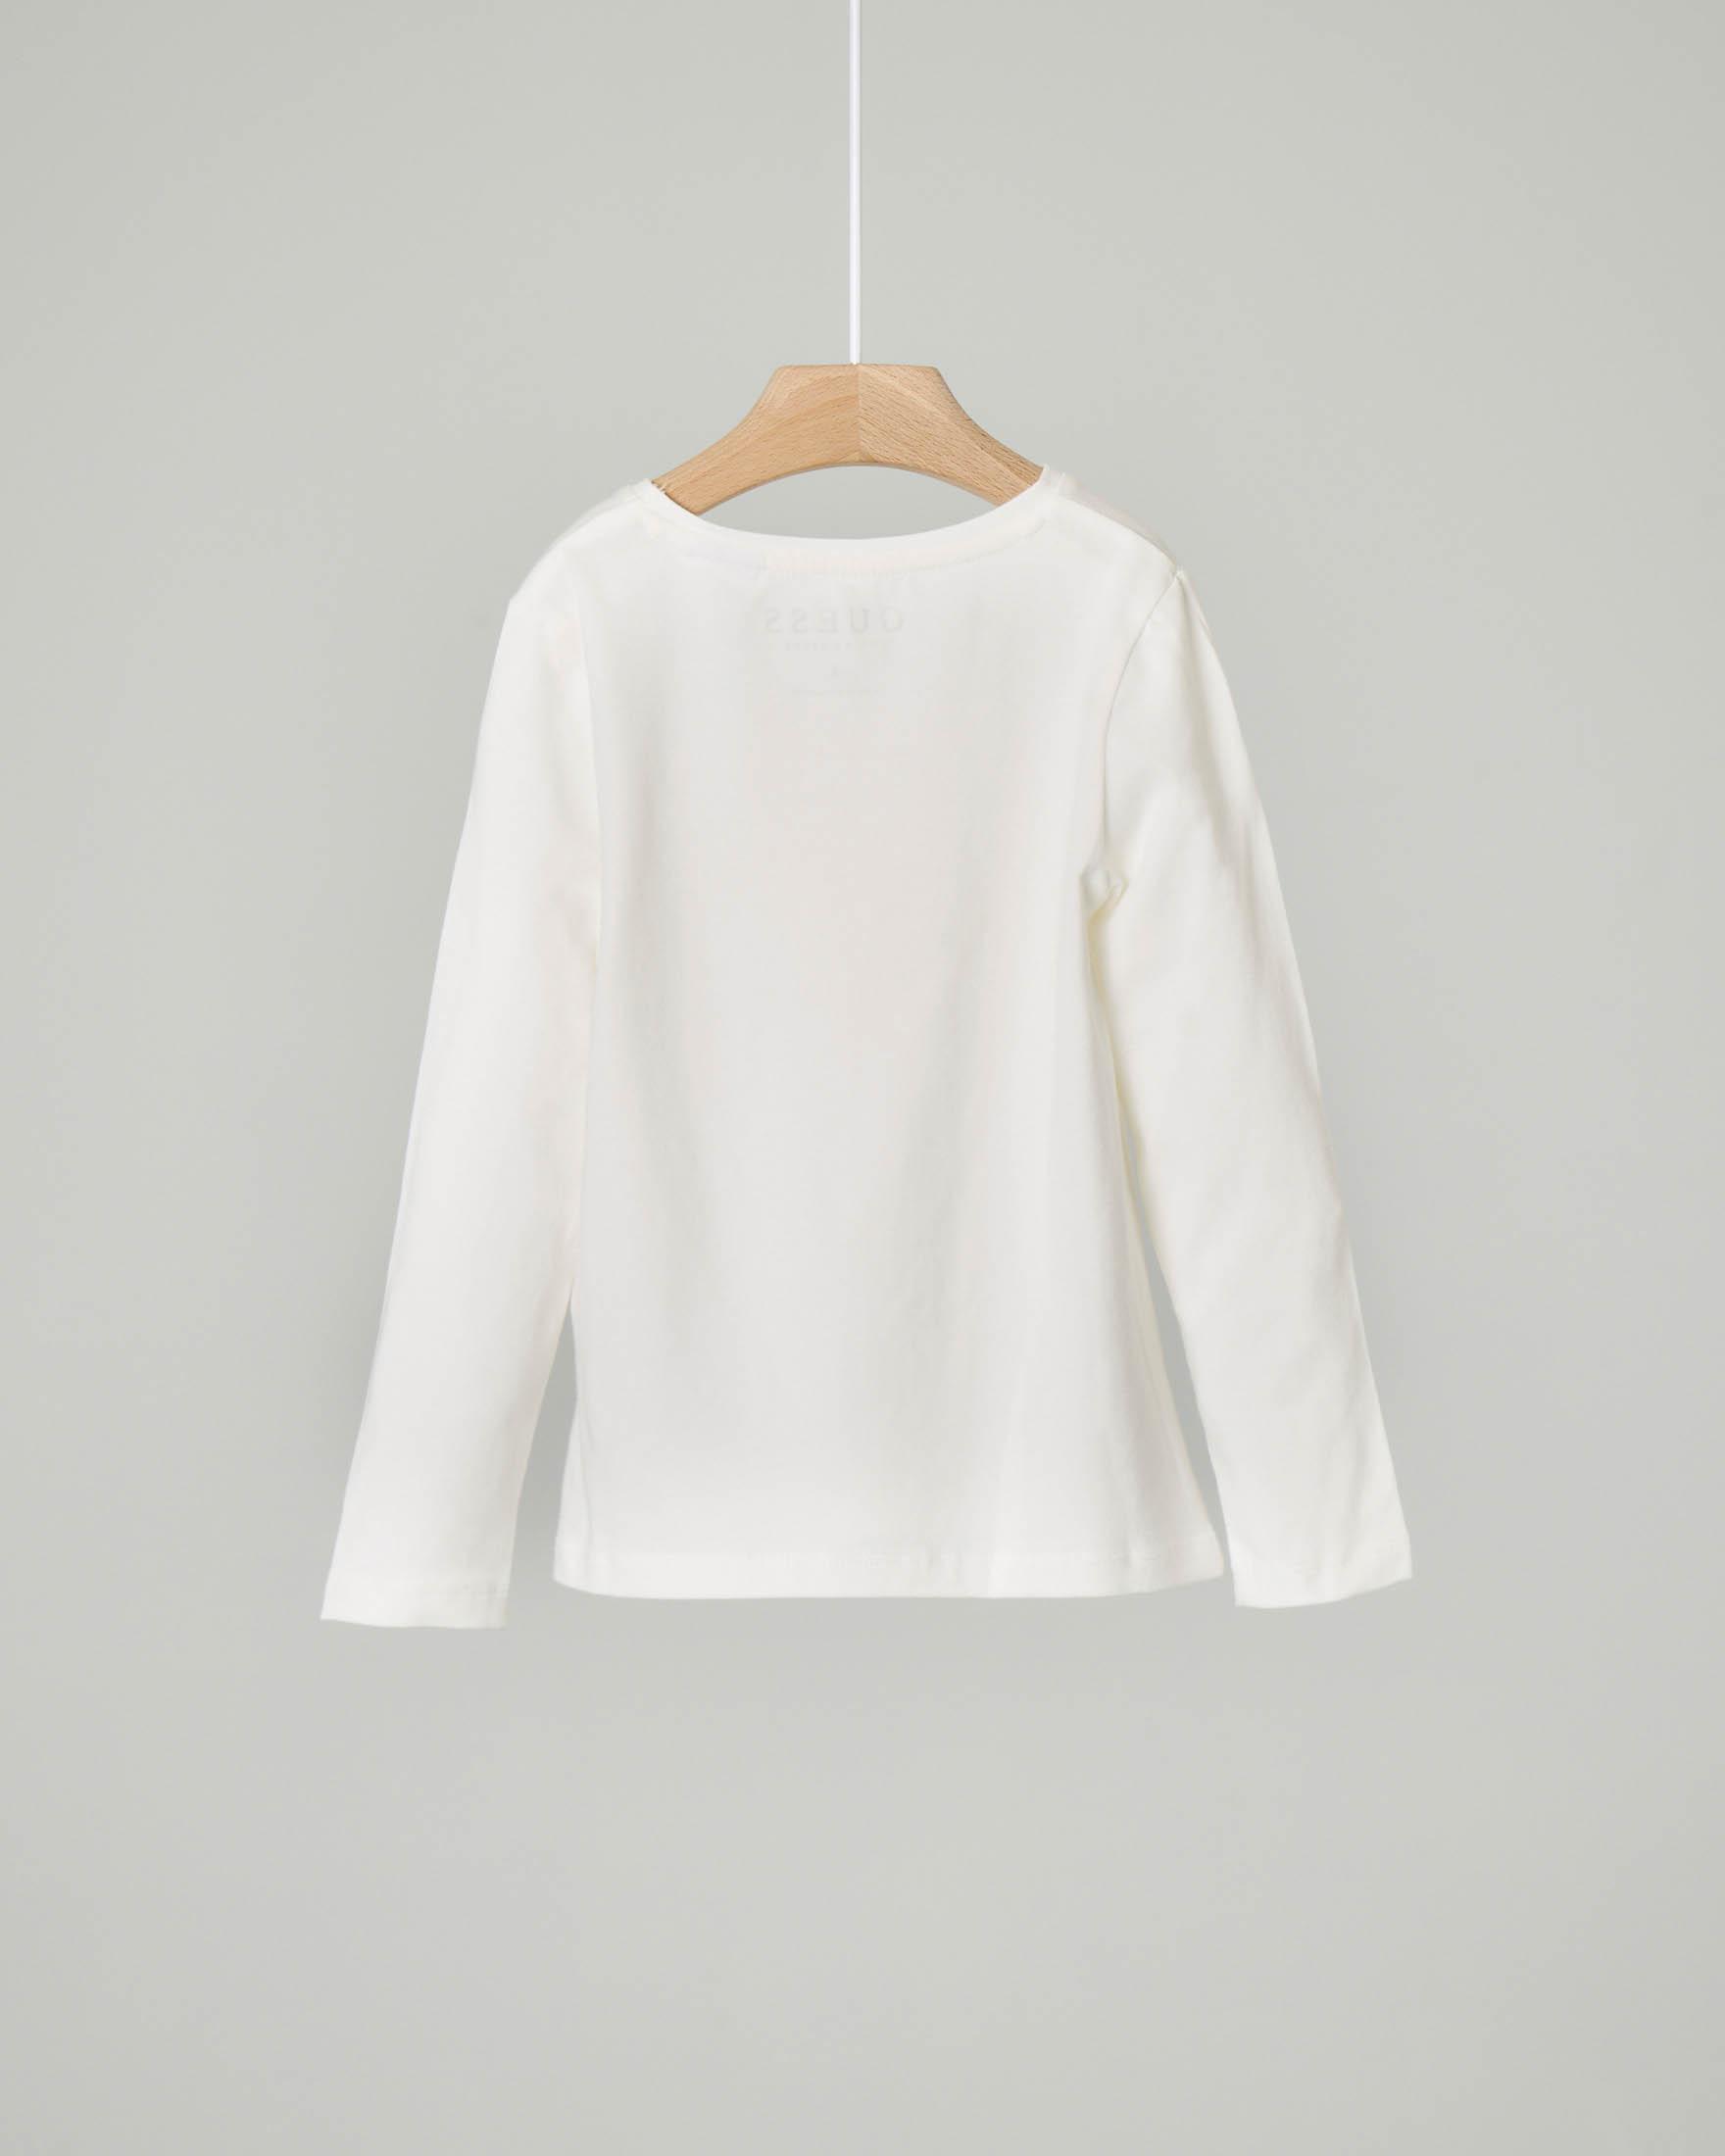 T-shirt bianca manica lunga in cotone con stampa logo glitter rosa 3-7 anni